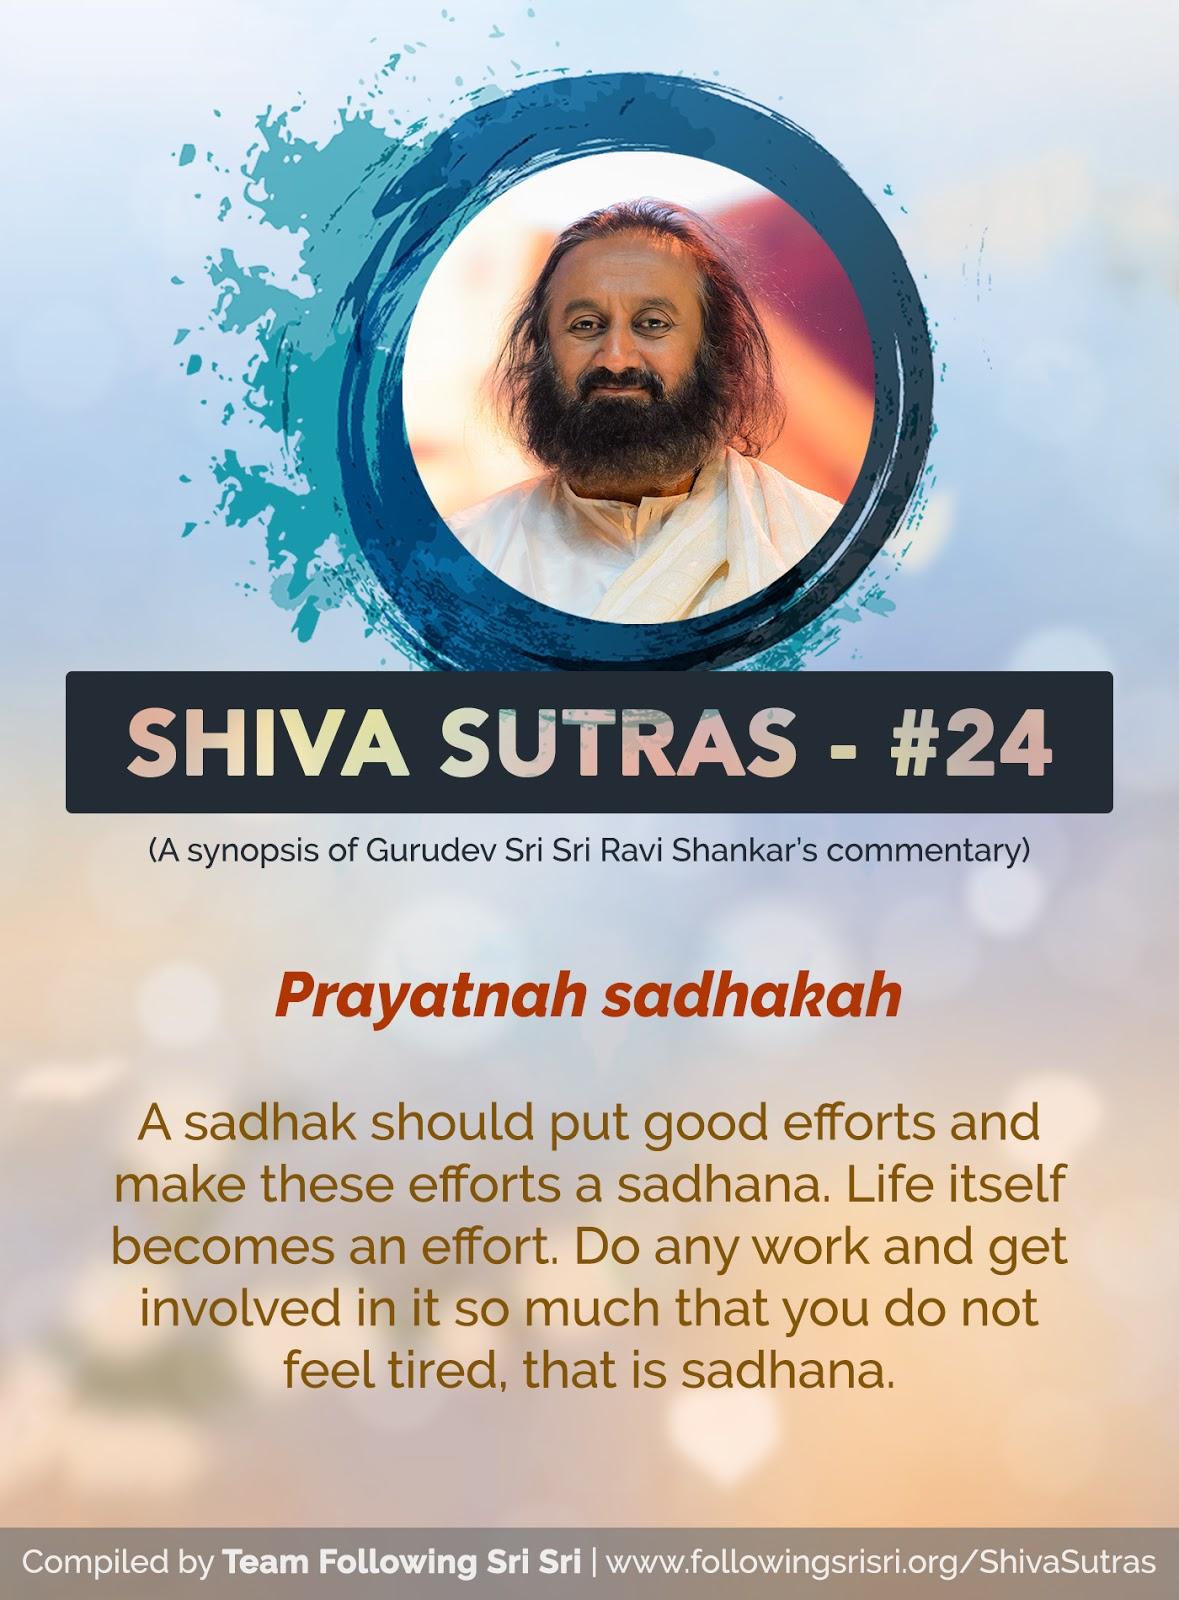 Shiva Sutras - Sutra 24